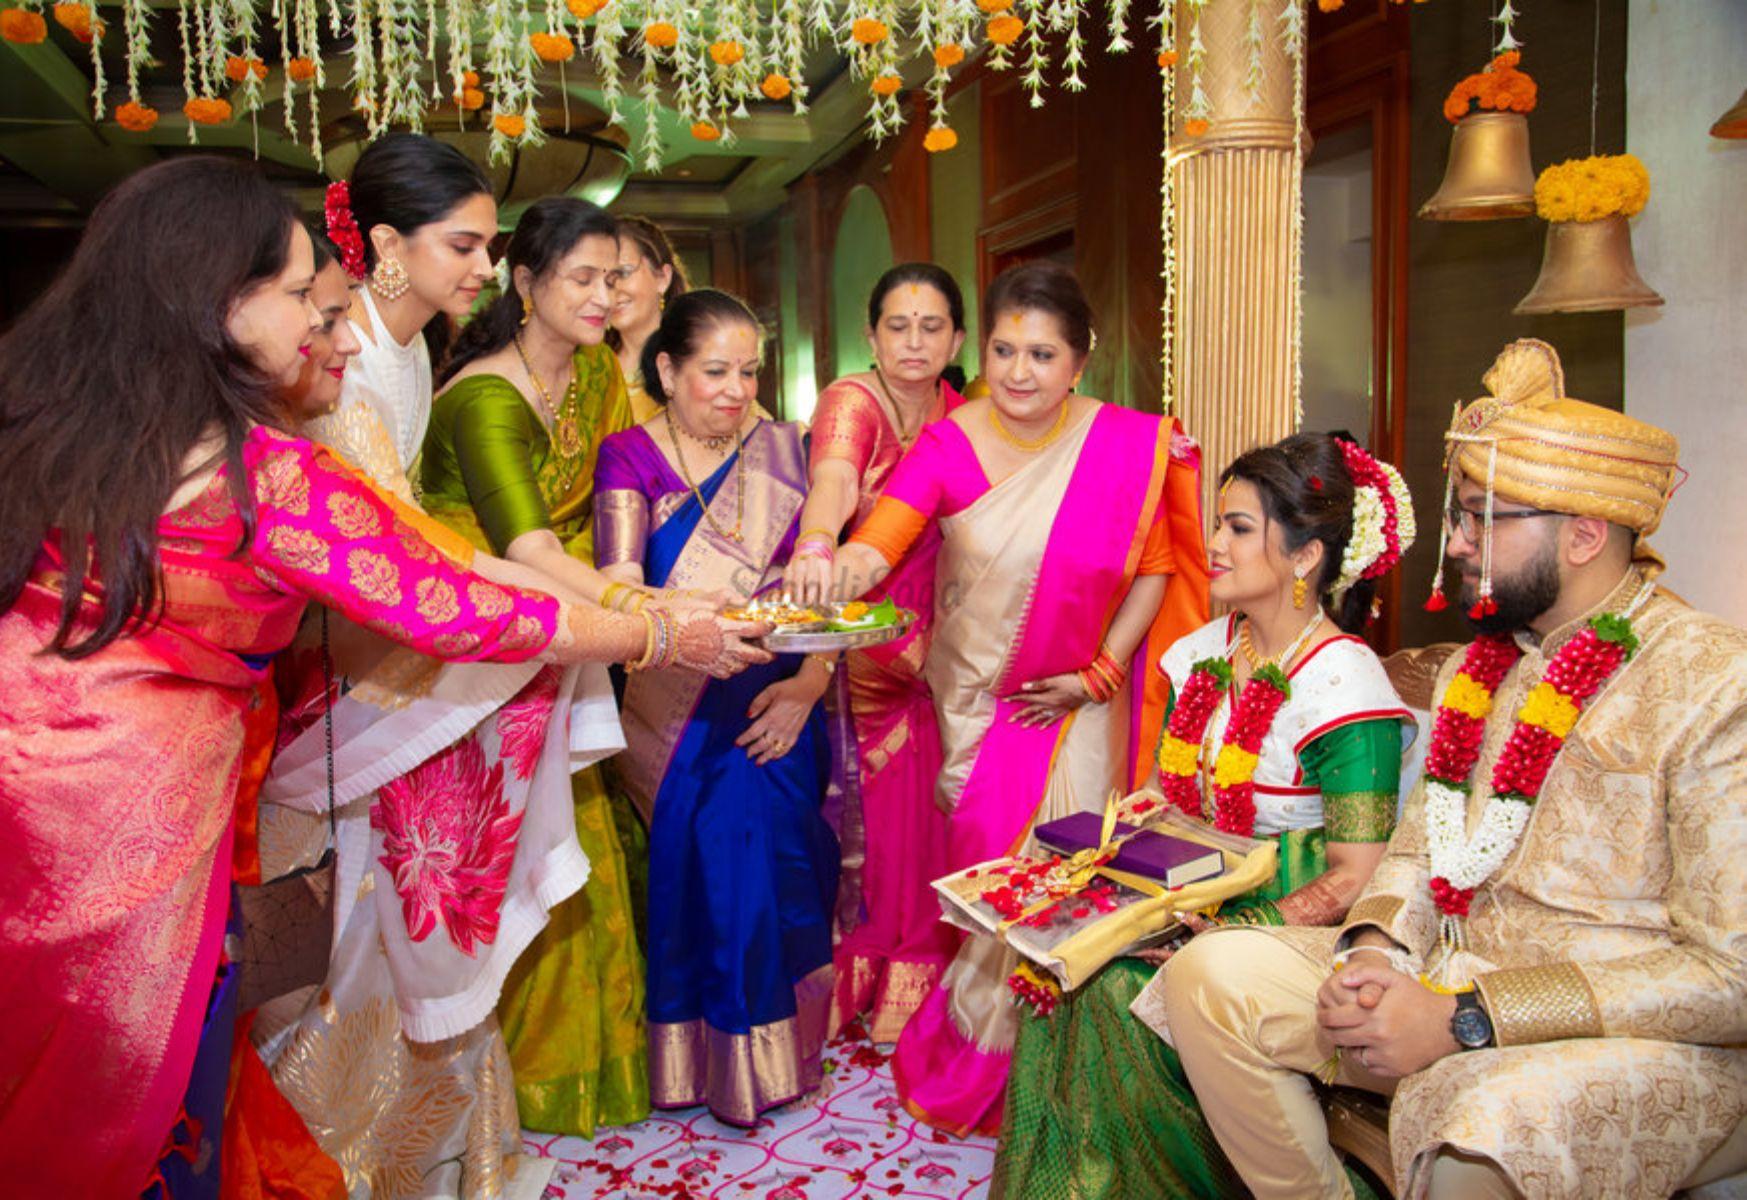 Deepika Padukone at her cousin's wedding Celebrity